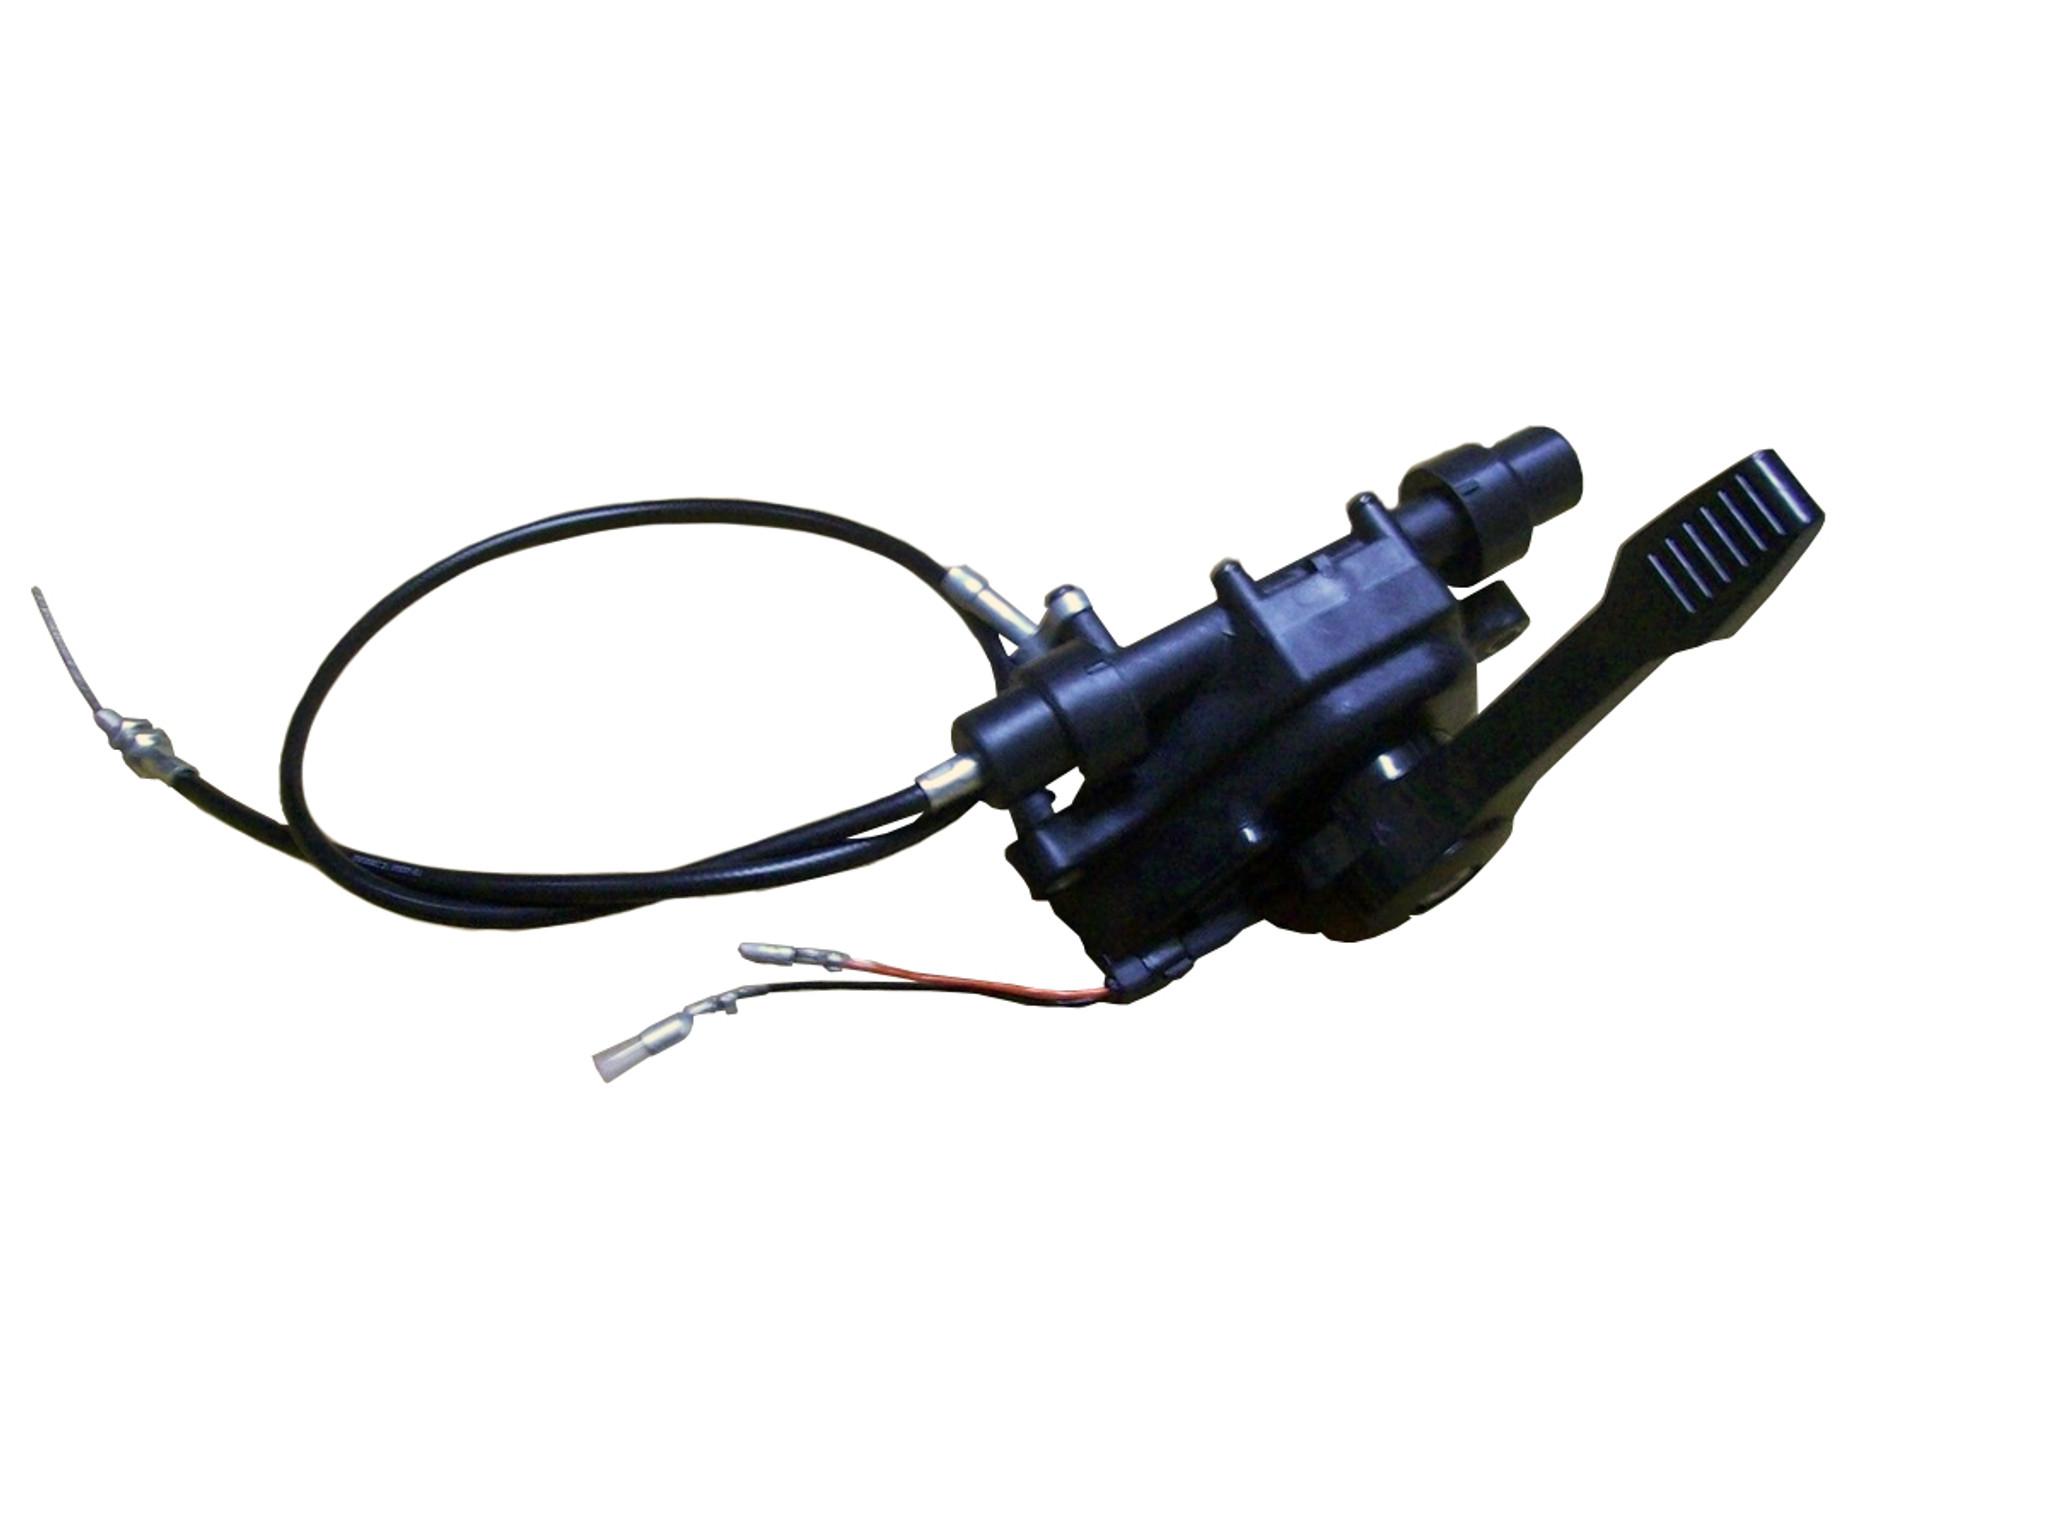 hight resolution of throttle assembly 94295 1498596131 jpg c 2